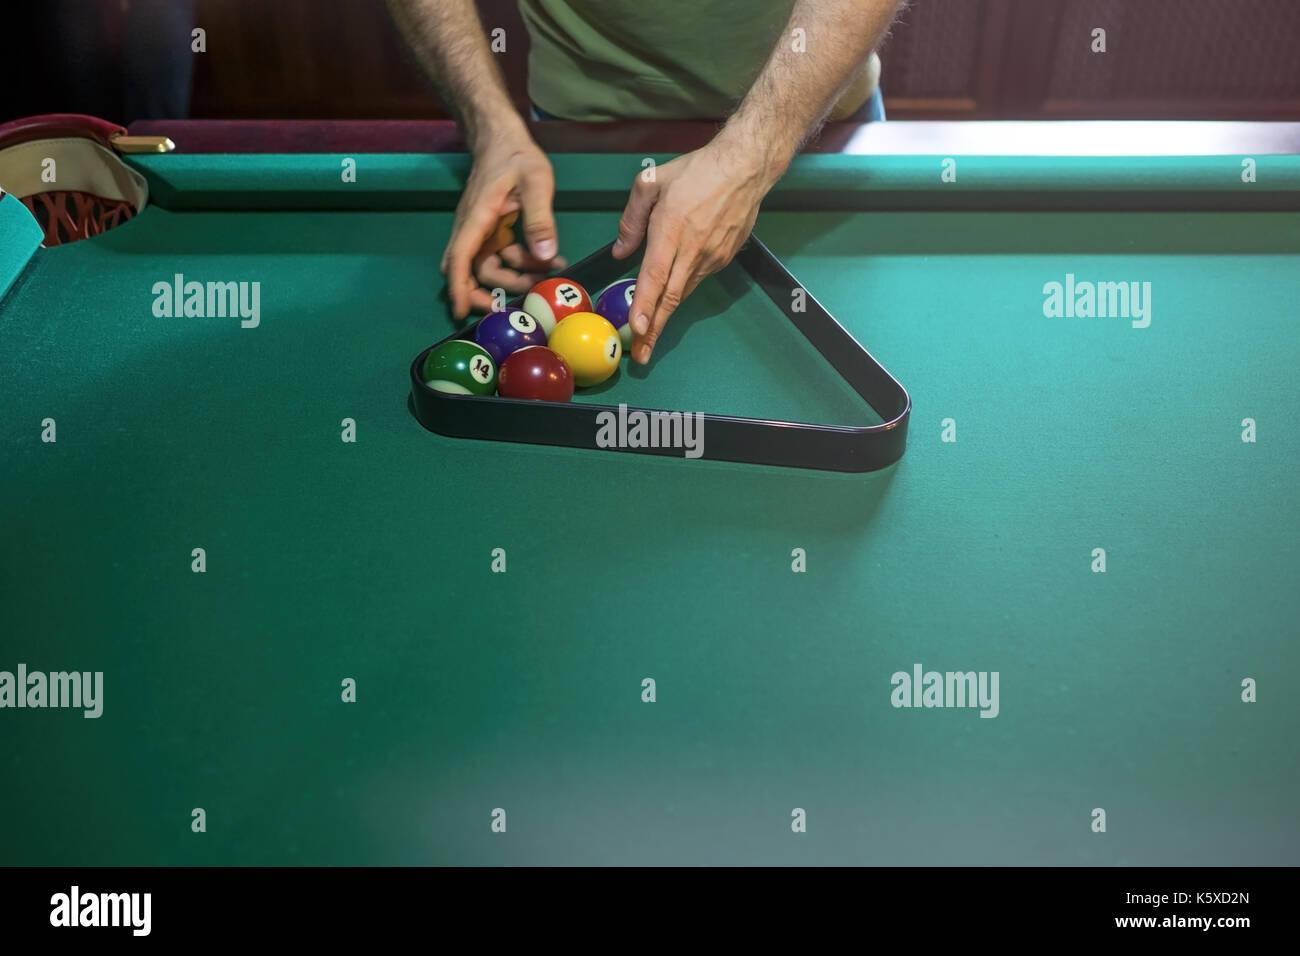 referee preparing the billiard balls on pool table - Stock Image